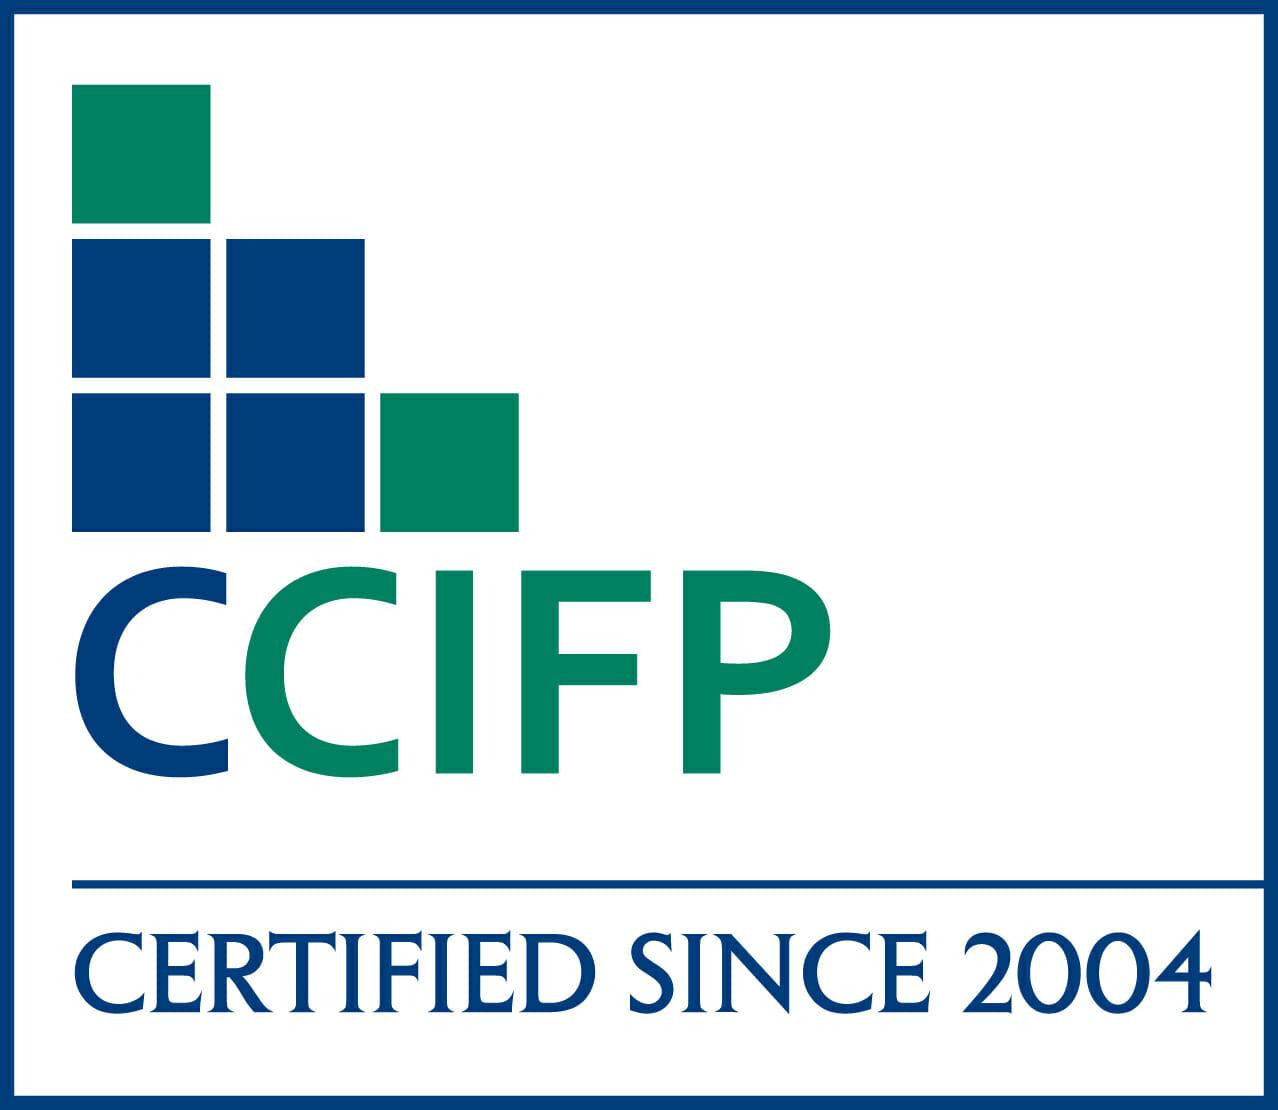 CCIFP- Christina Chifici since 2004